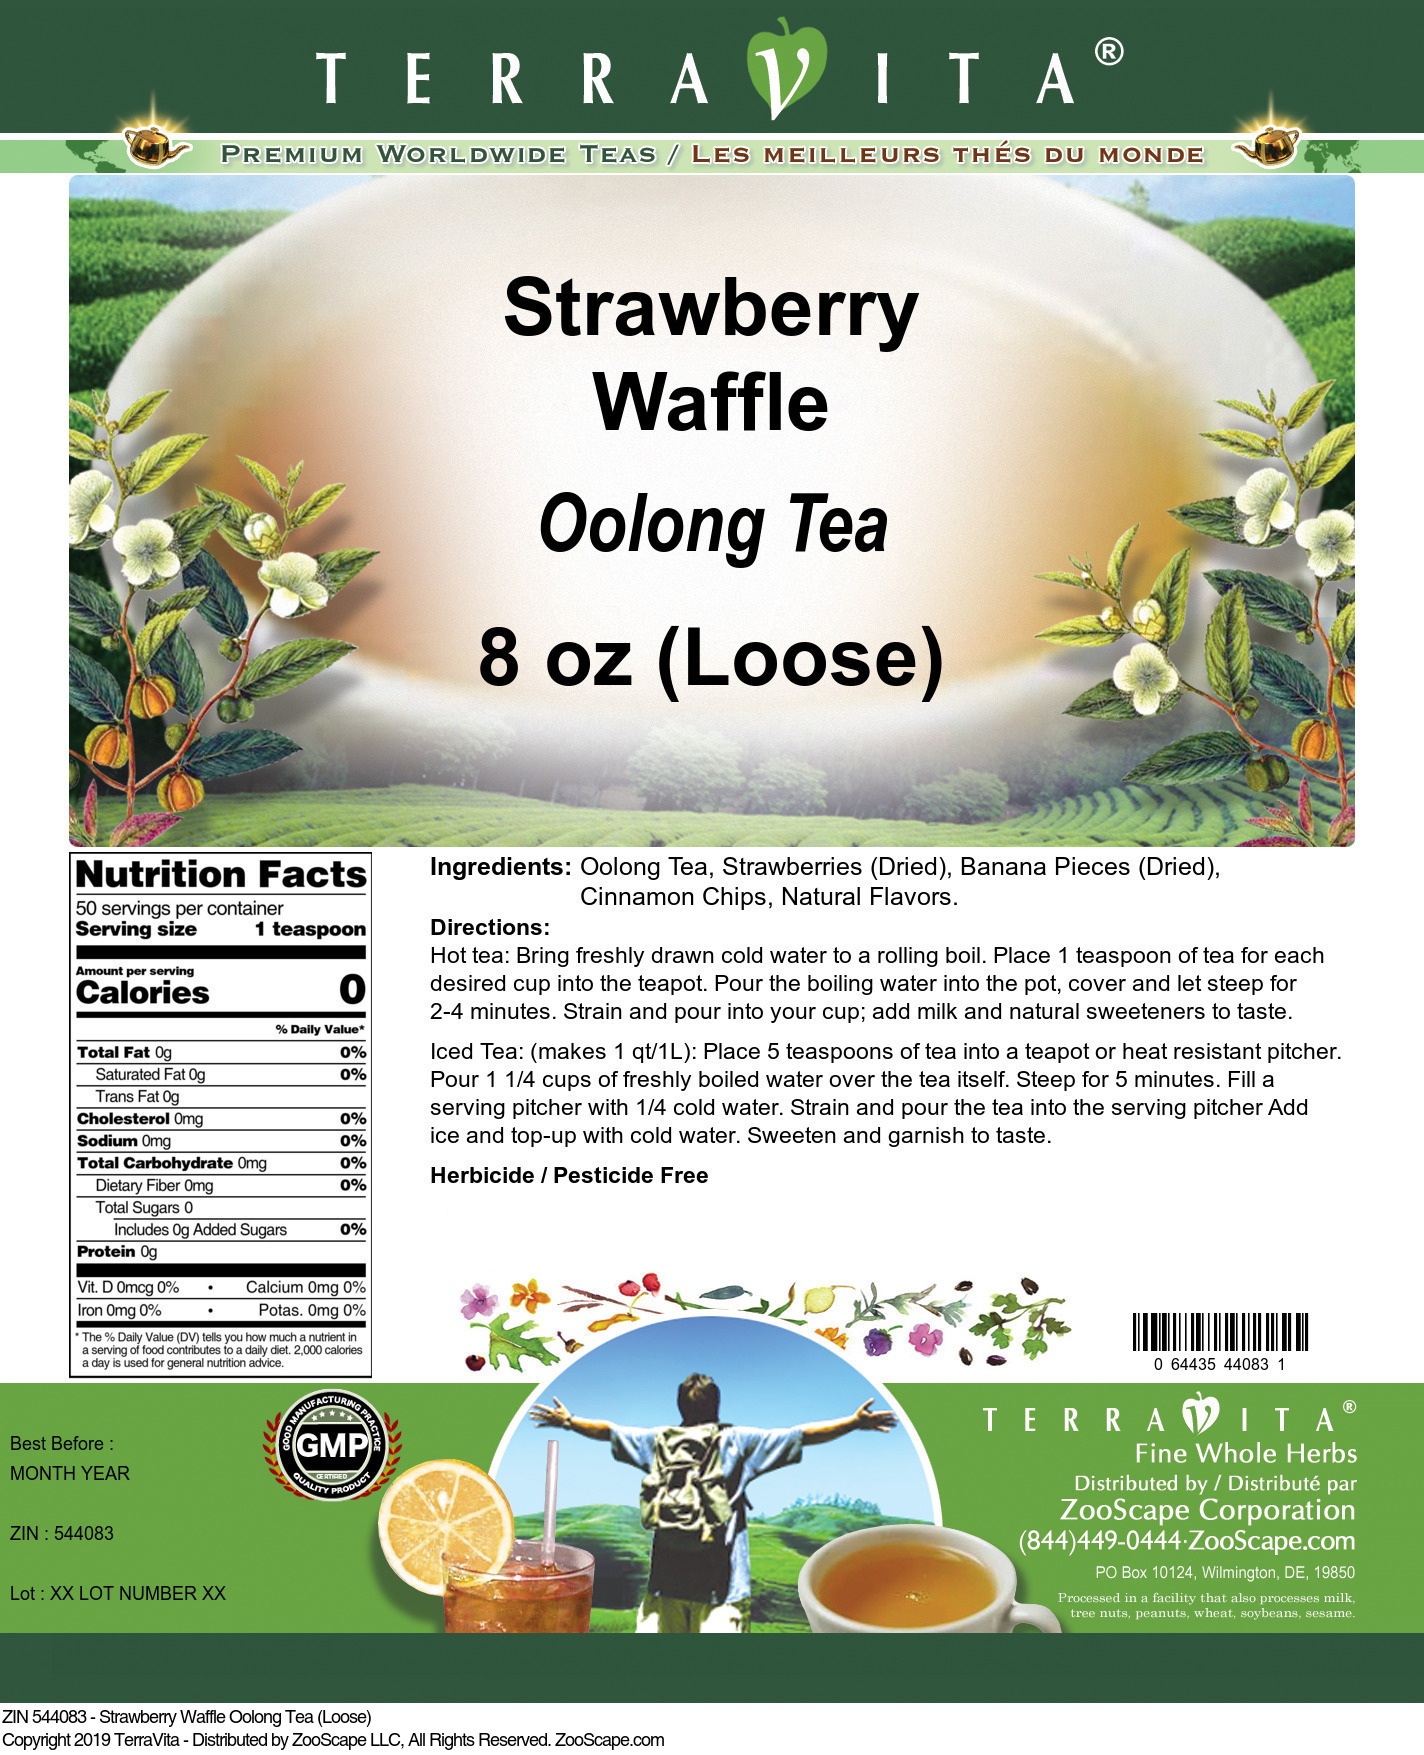 Strawberry Waffle Oolong Tea